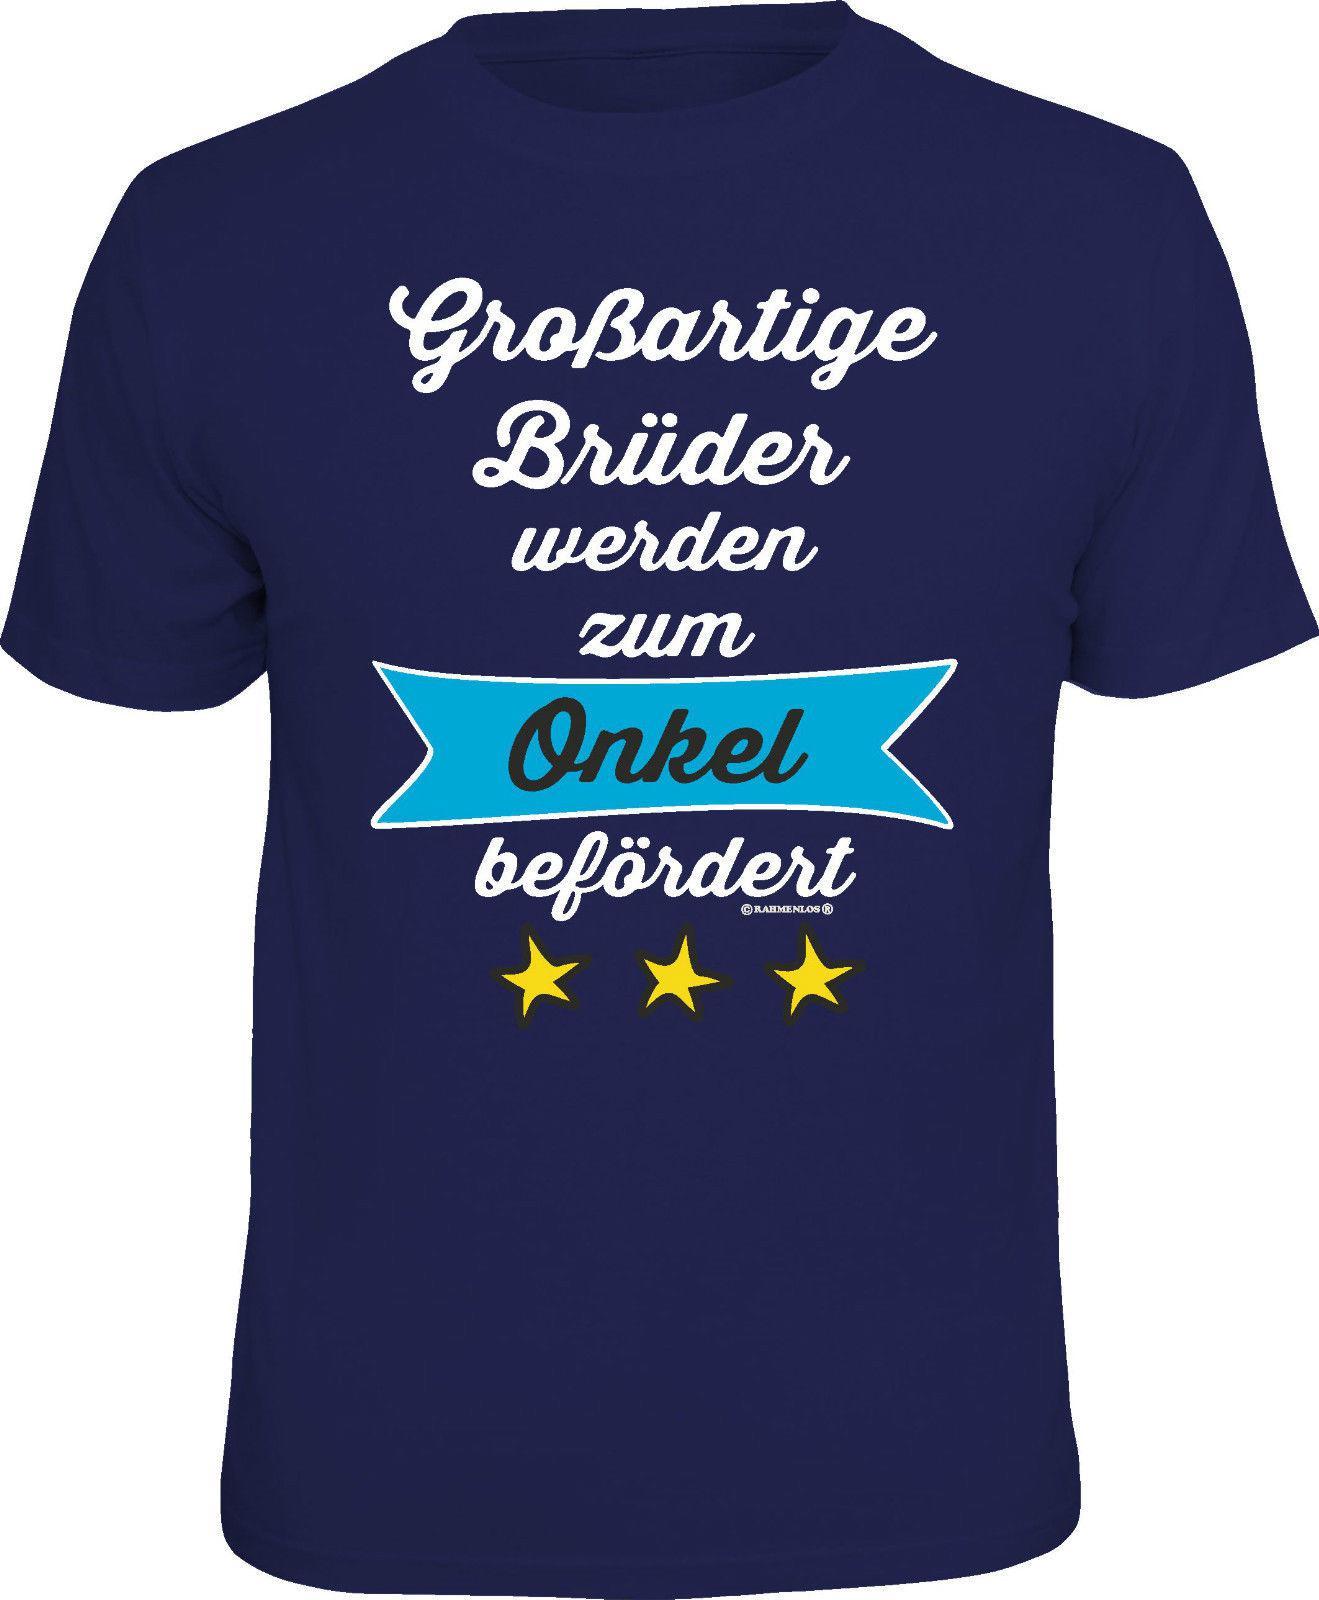 Geburtstag T Shirt Grossartiger Bruder Zum Onkel Vatertag Shirt